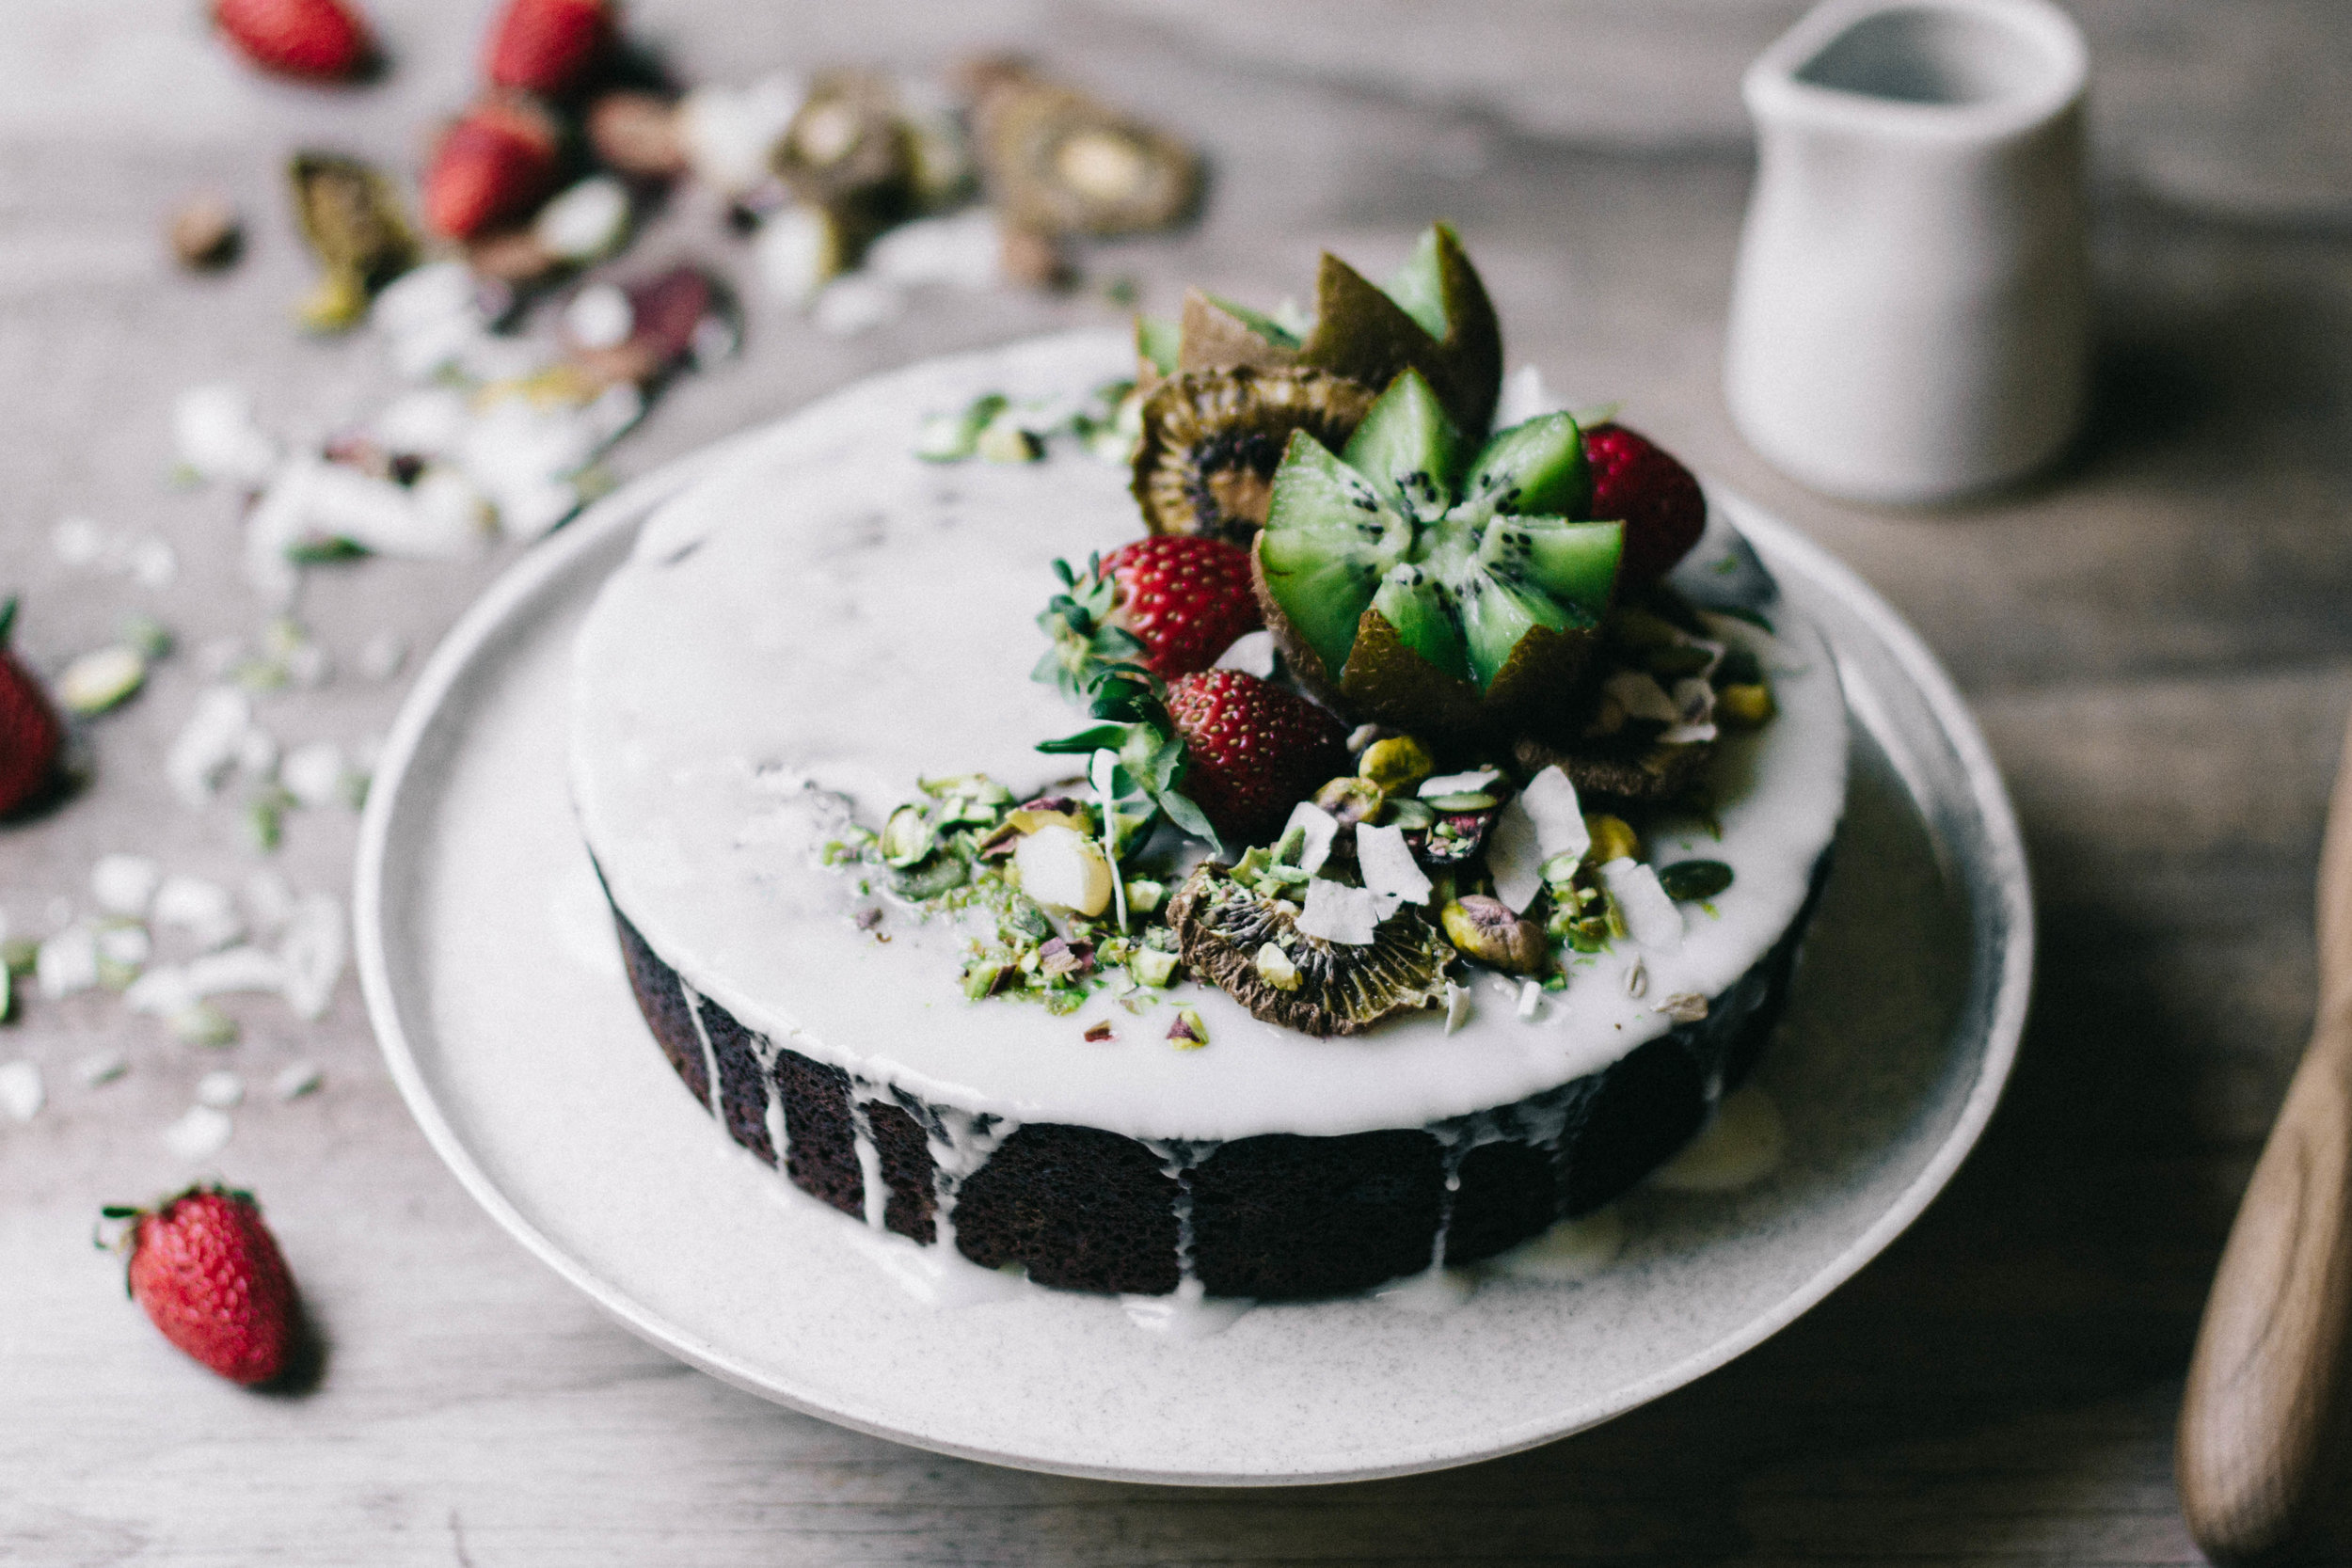 Lemon, Poppy Seed & Lavender Cake⎜The Botanical Kitchen